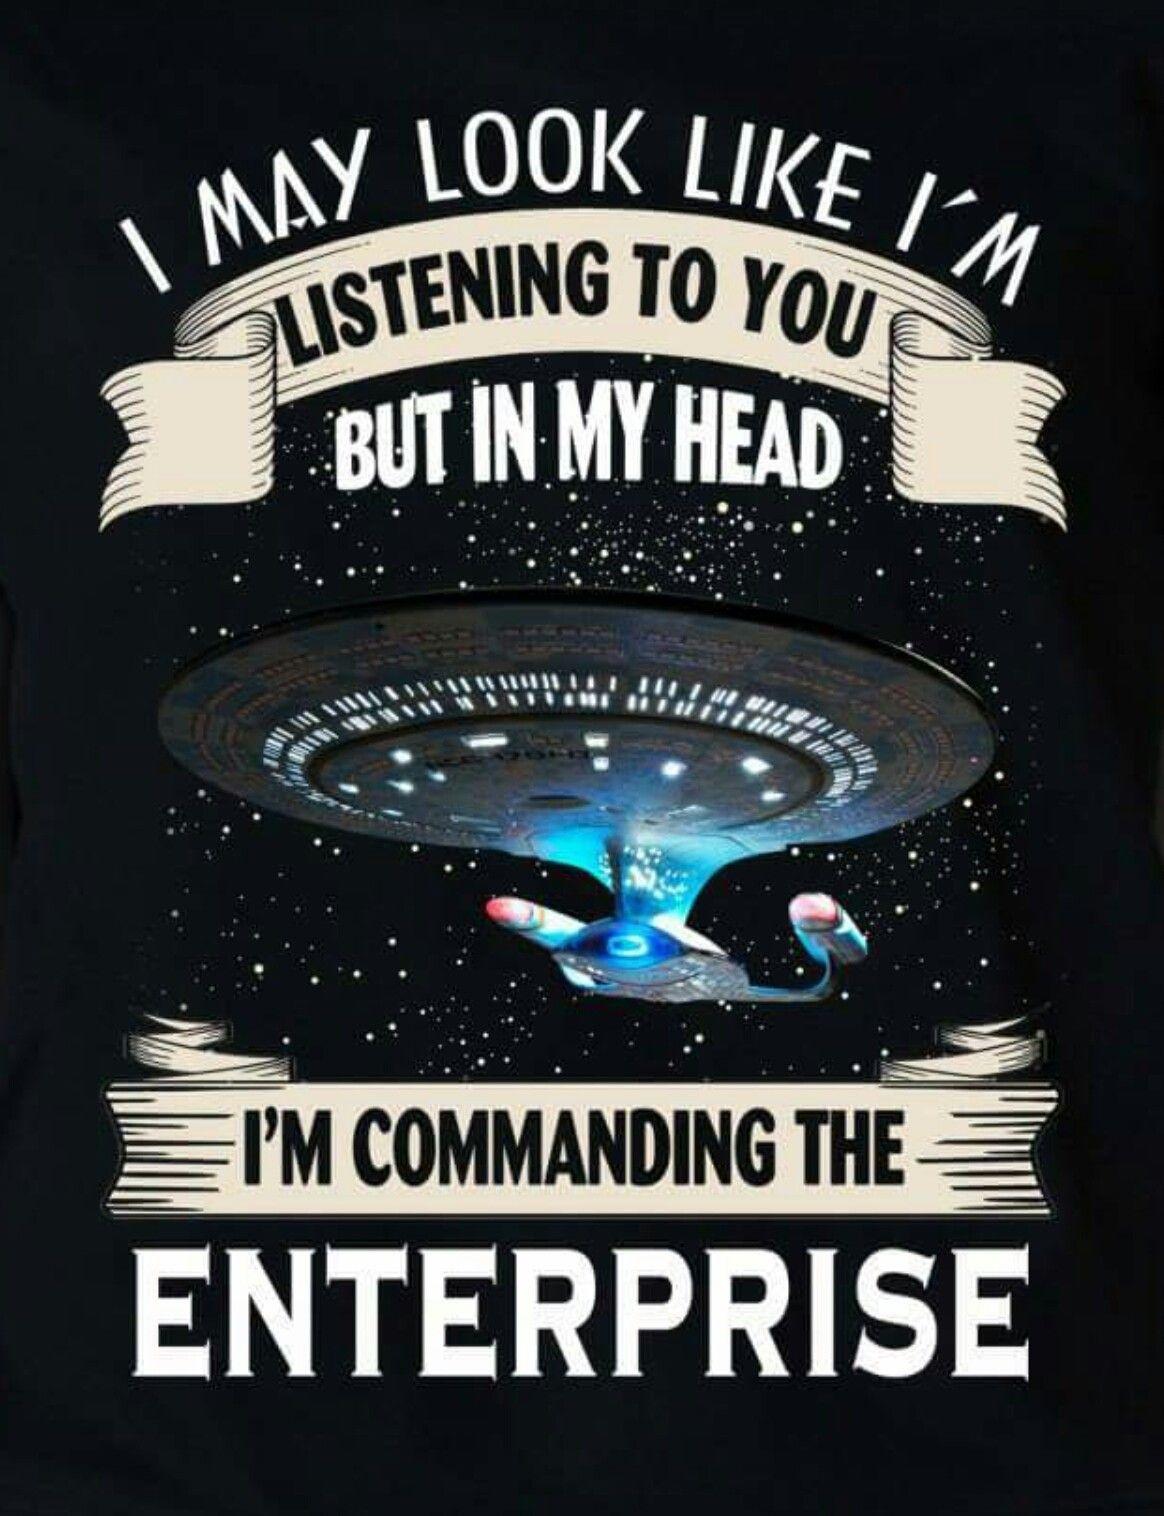 Star Trek Car Warranty Meme